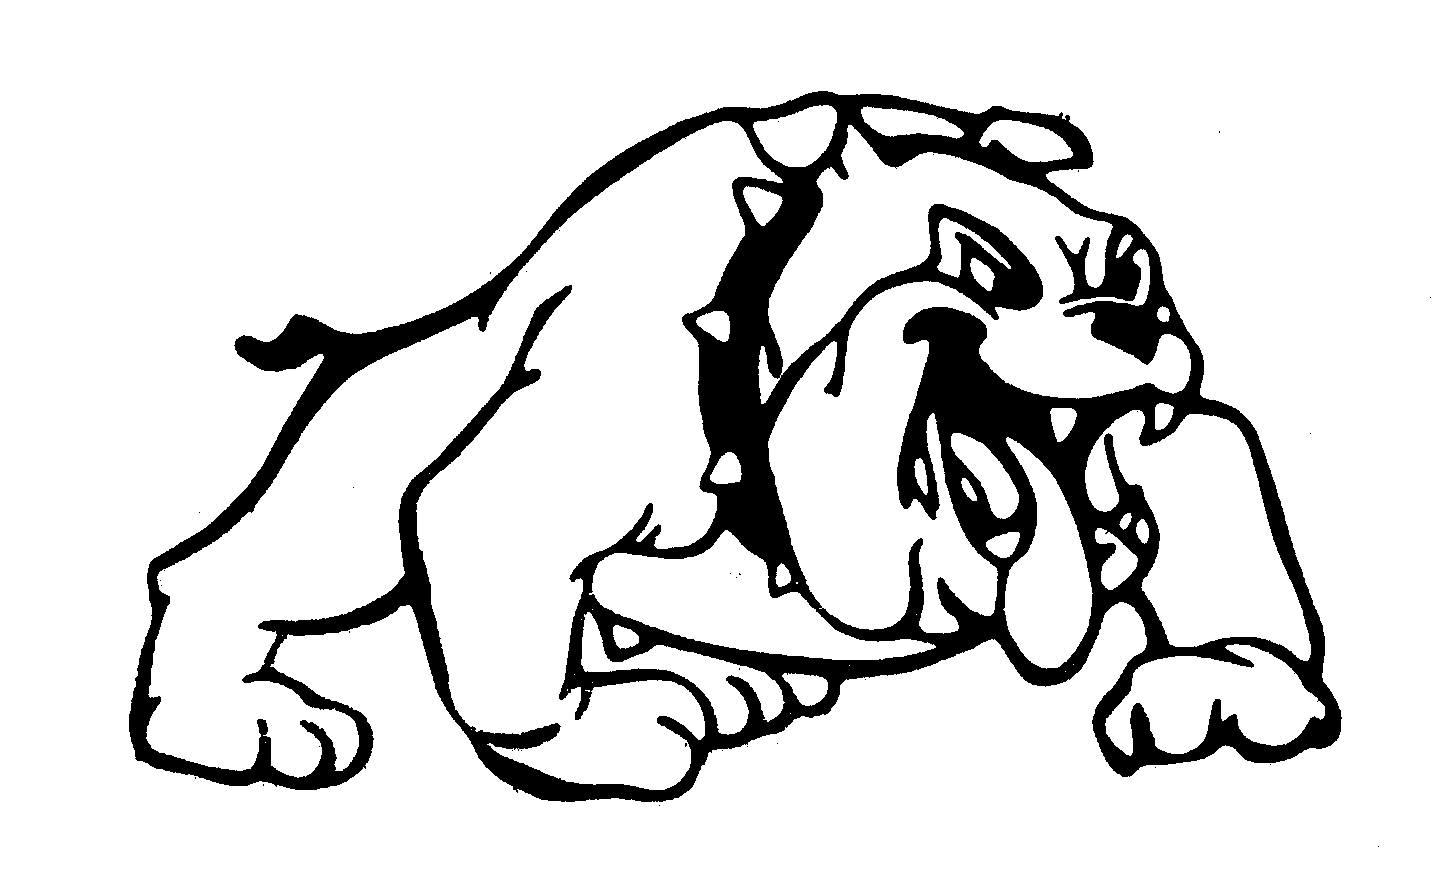 Bulldog Mascot Clipart Clipart Best-Bulldog Mascot Clipart Clipart Best-5